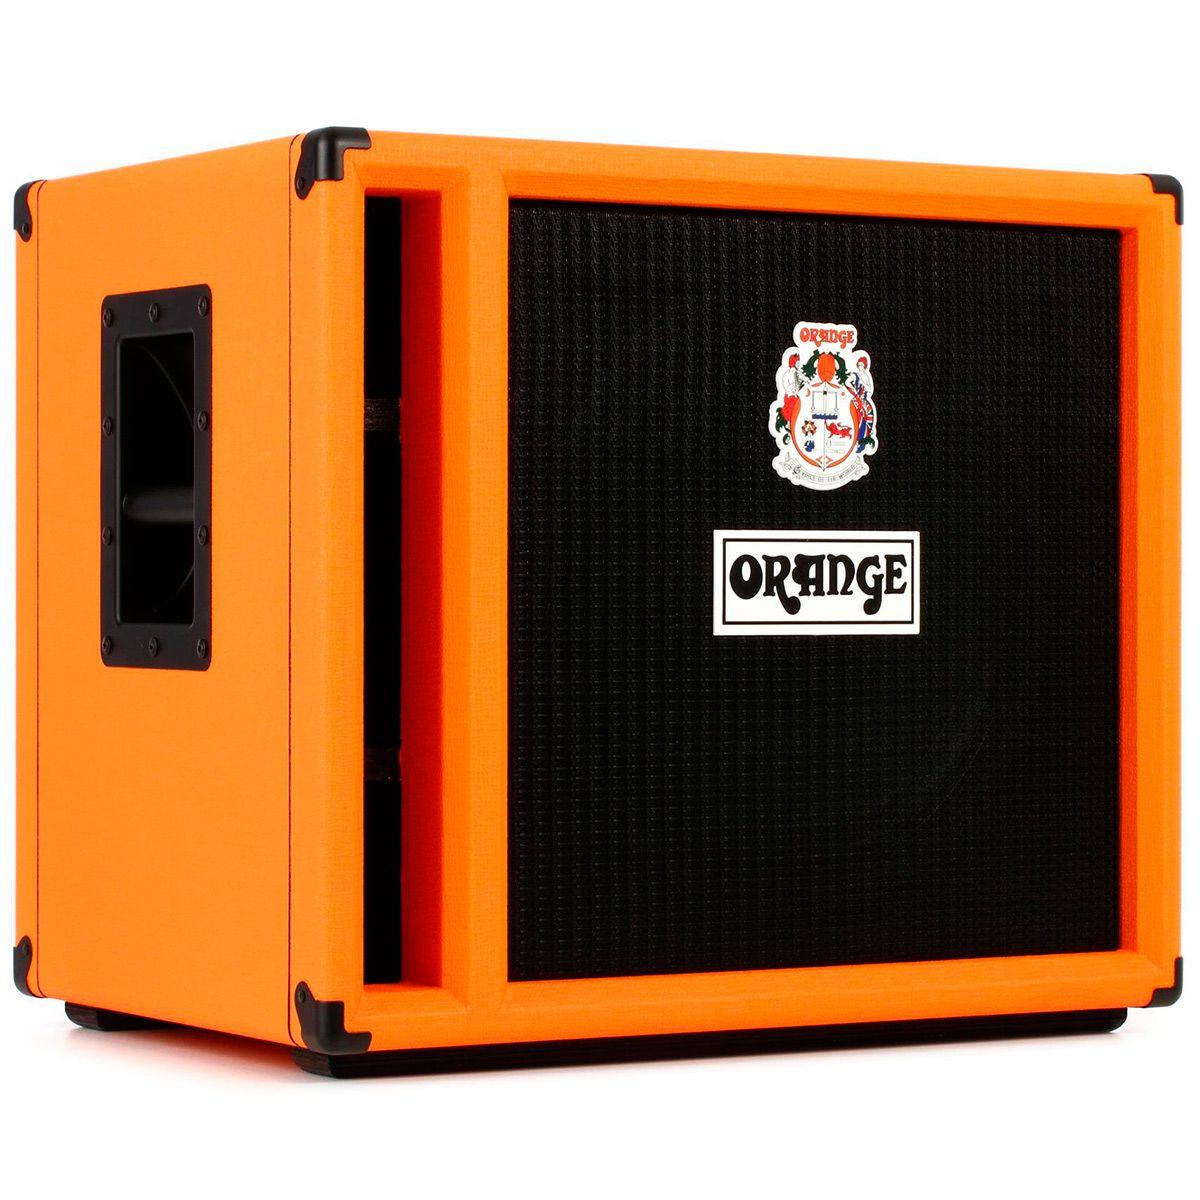 Gabinete Orange OBC210 2x10 300W para Contrabaixo